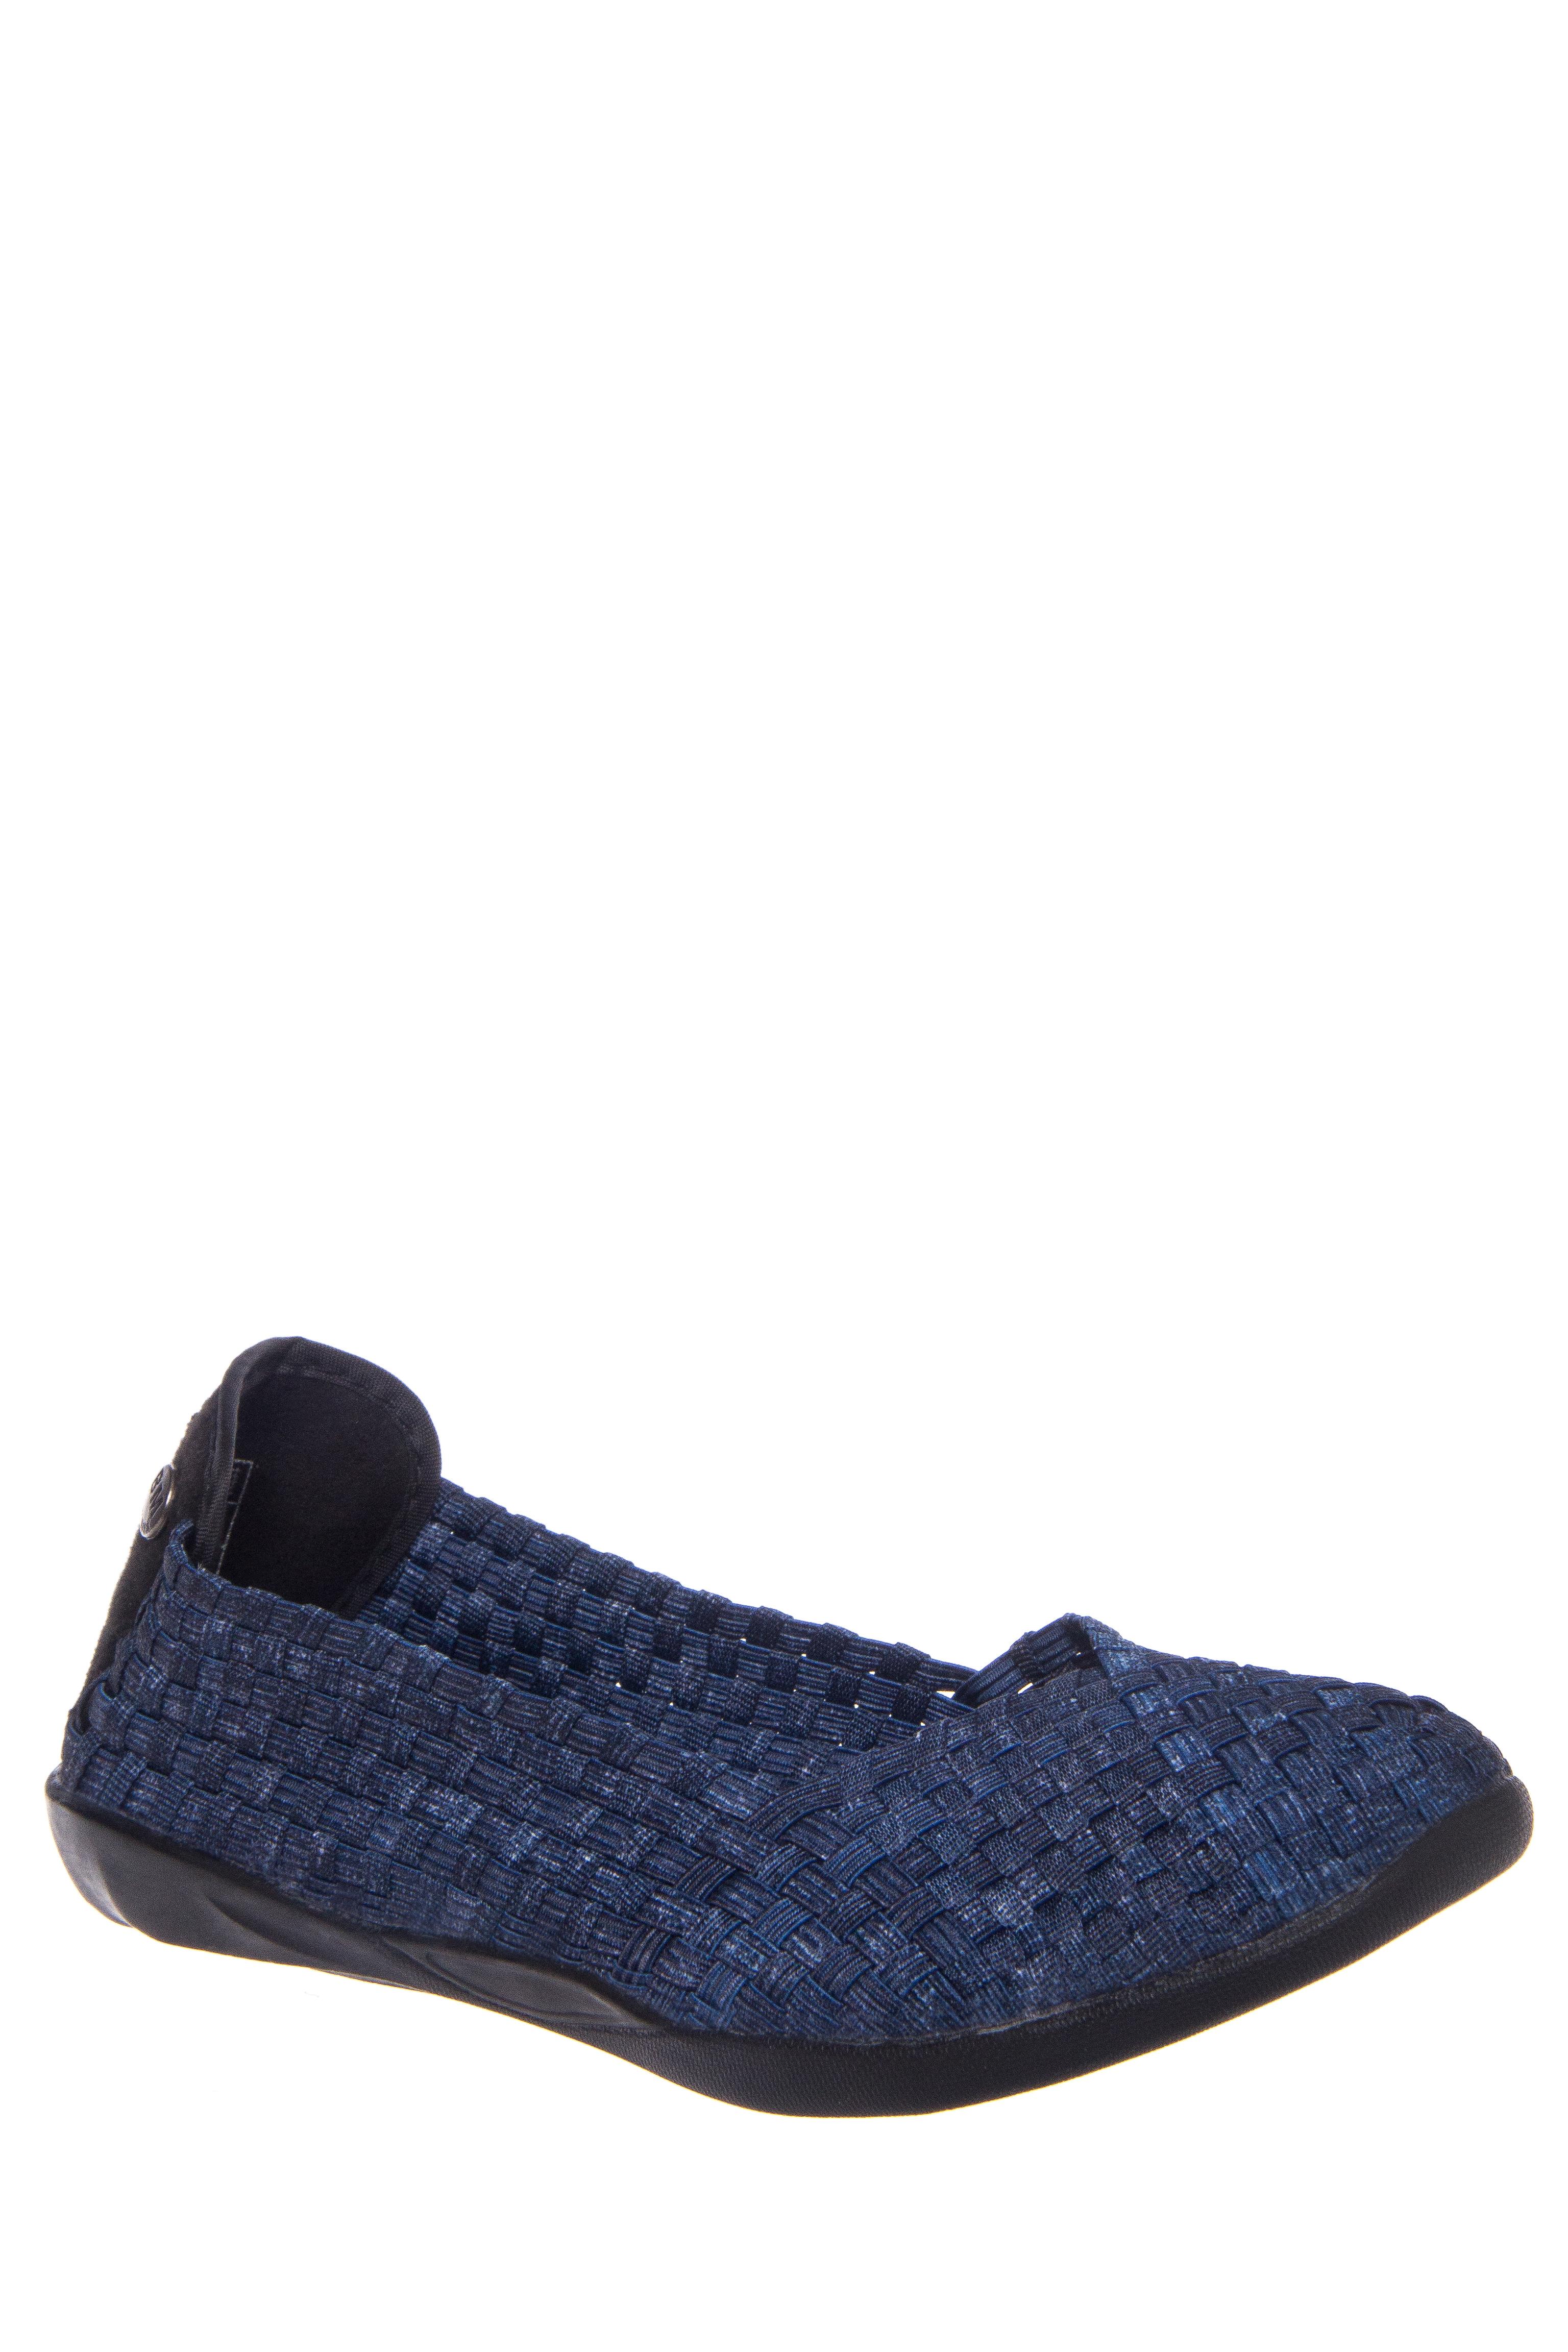 Bernie Mev Catwalk Comfort Flats - Blue